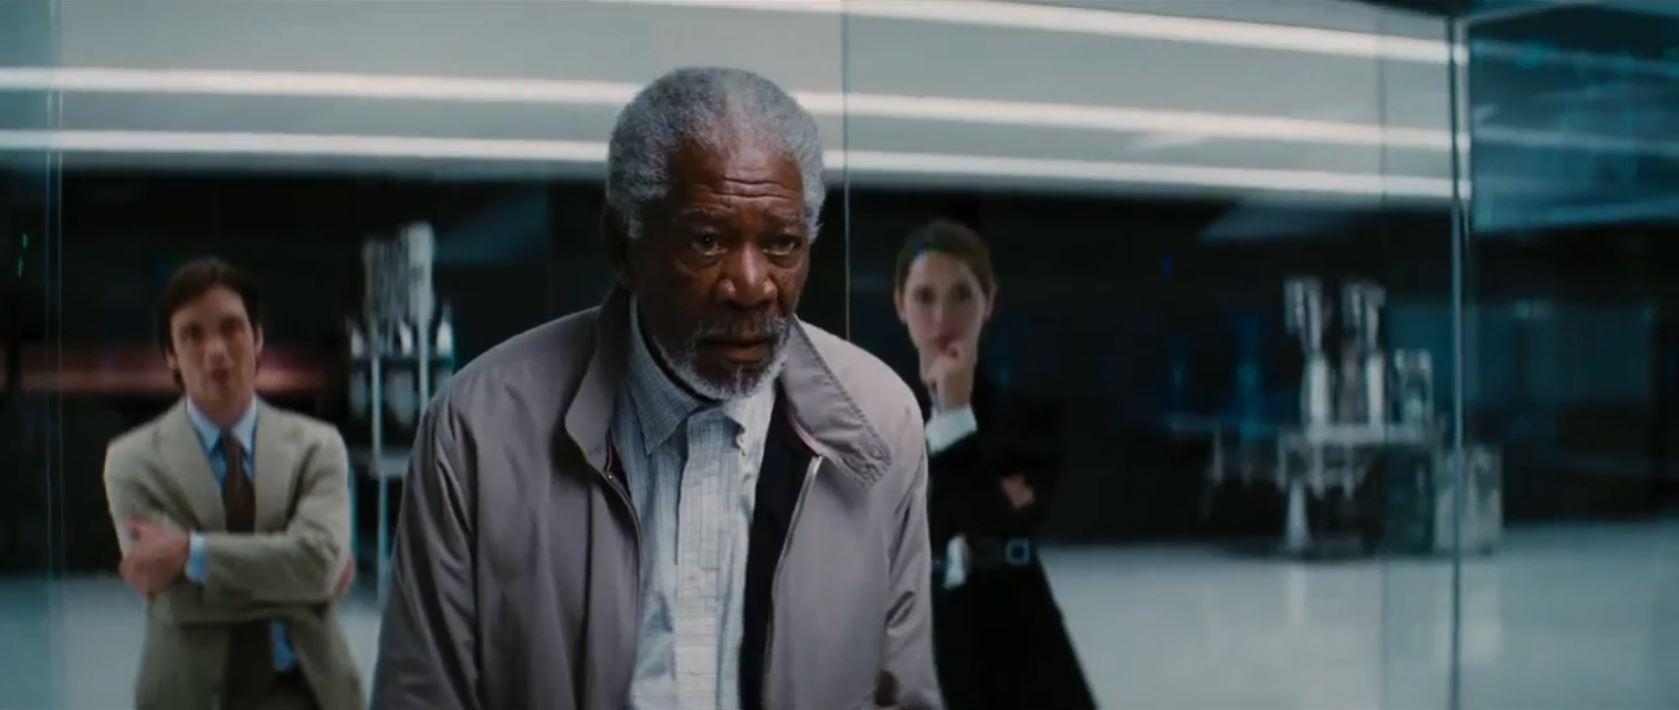 transcendence movie - Morgan Freeman as Joseph